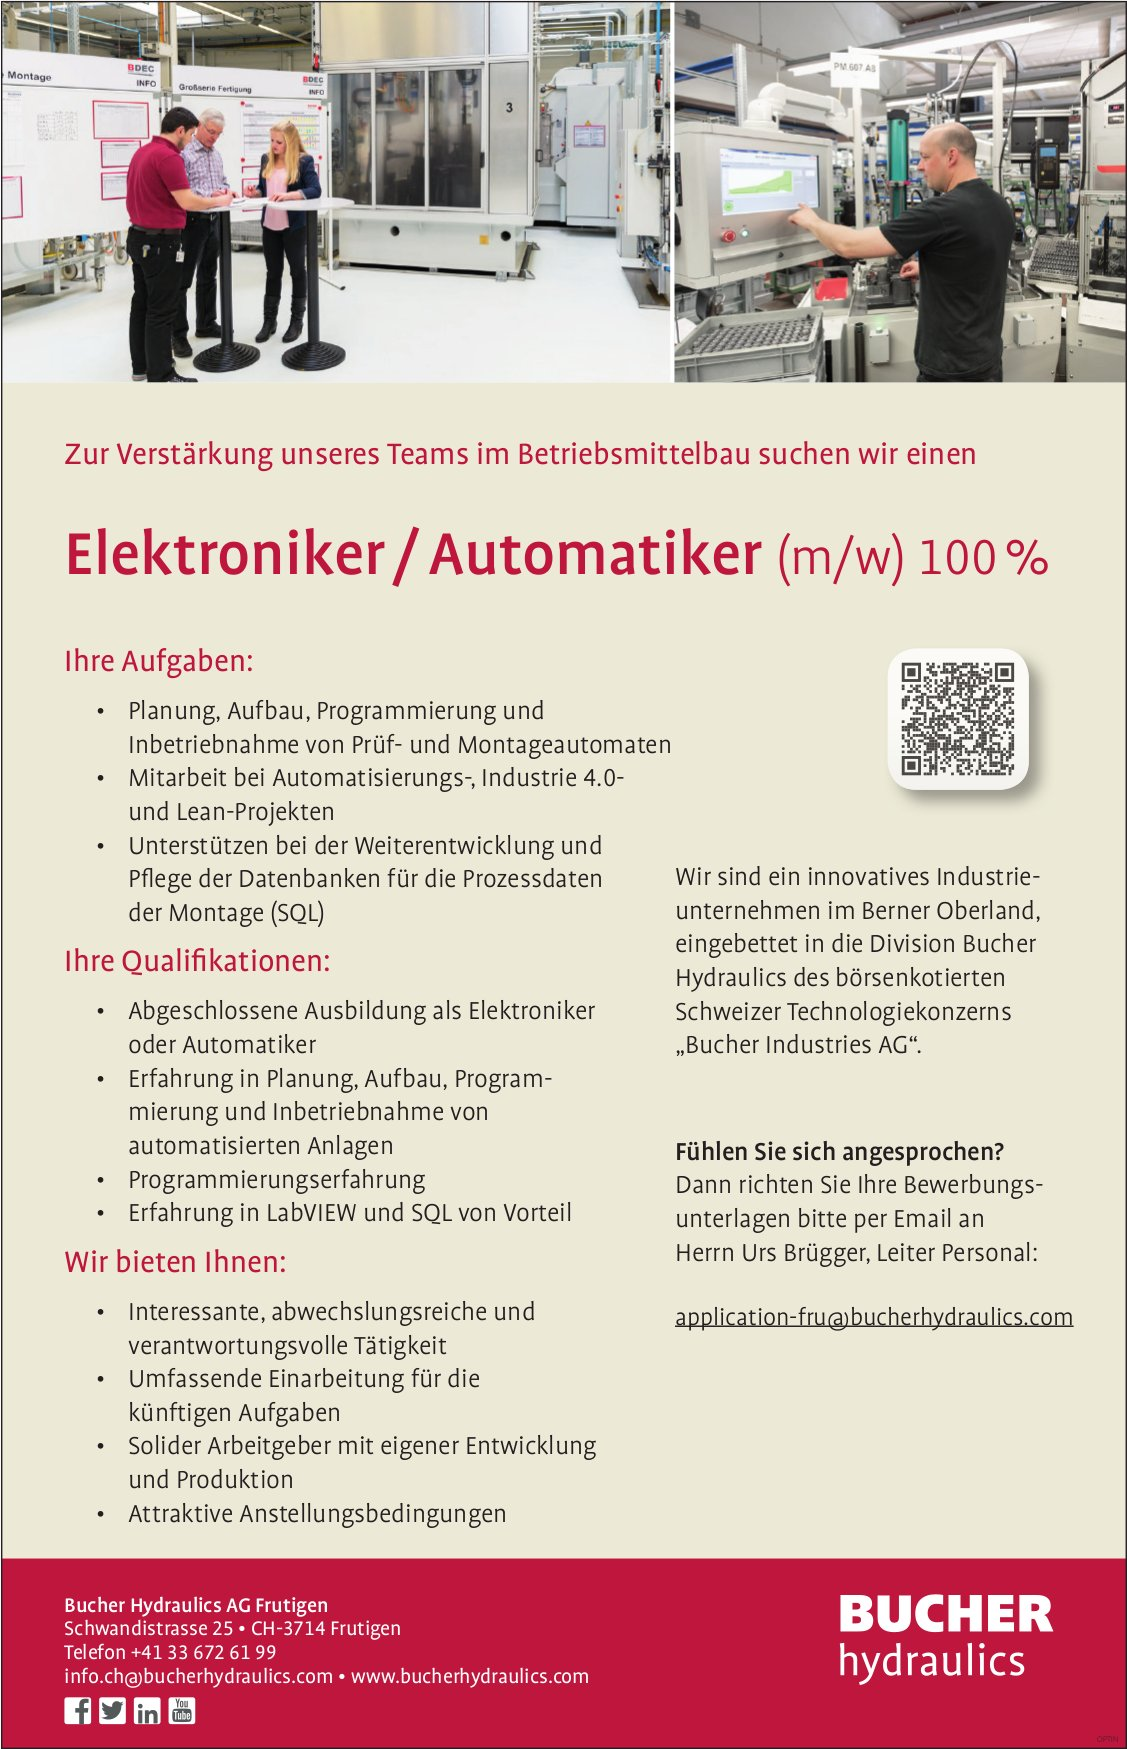 Elektroniker / Automatiker (m/w) 100%, Bucher Hydraulics AG,  Frutigen, Gesucht